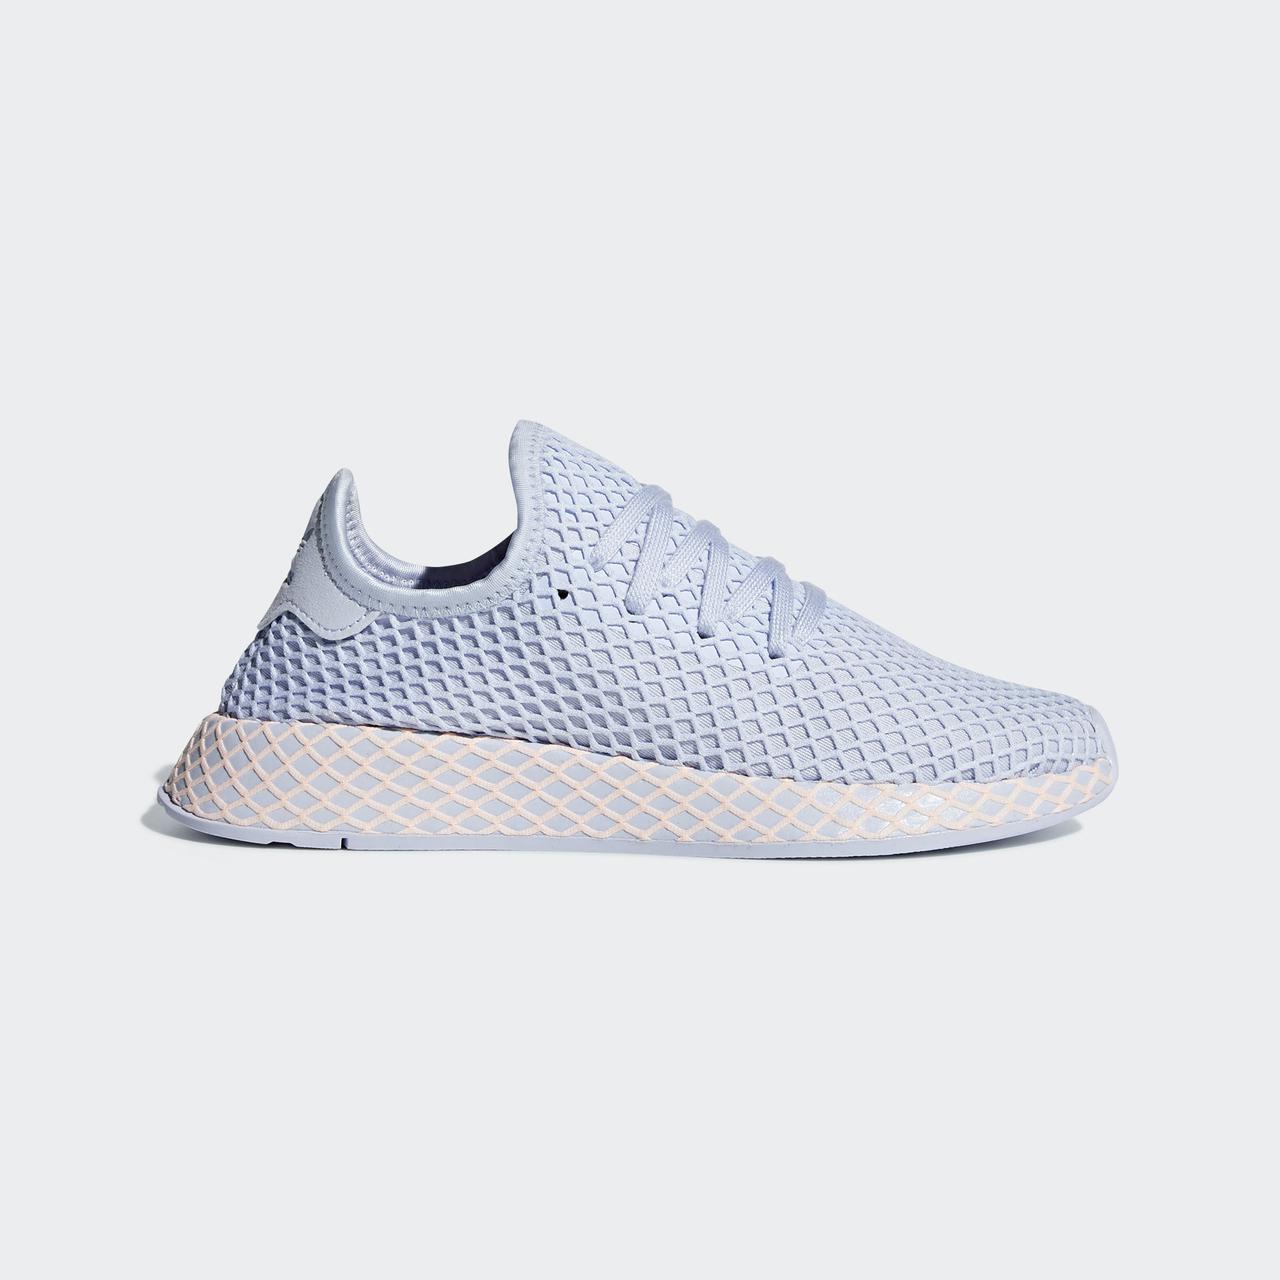 d0cc46d9 Купить Женские кроссовки Adidas Originals Deerupt Runner (Артикул ...